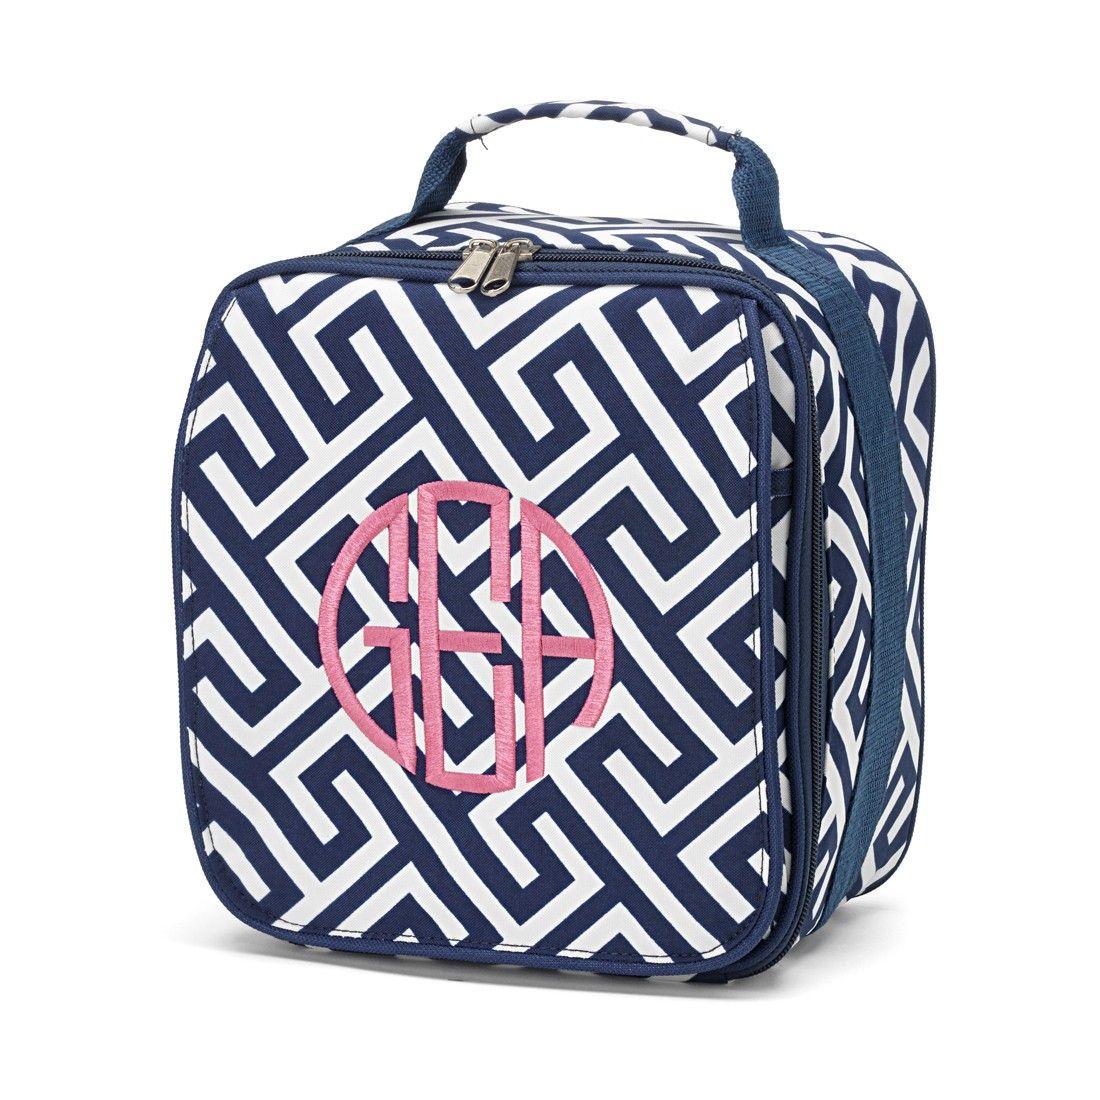 WB Products // Navy Greek Key Lunch Bag